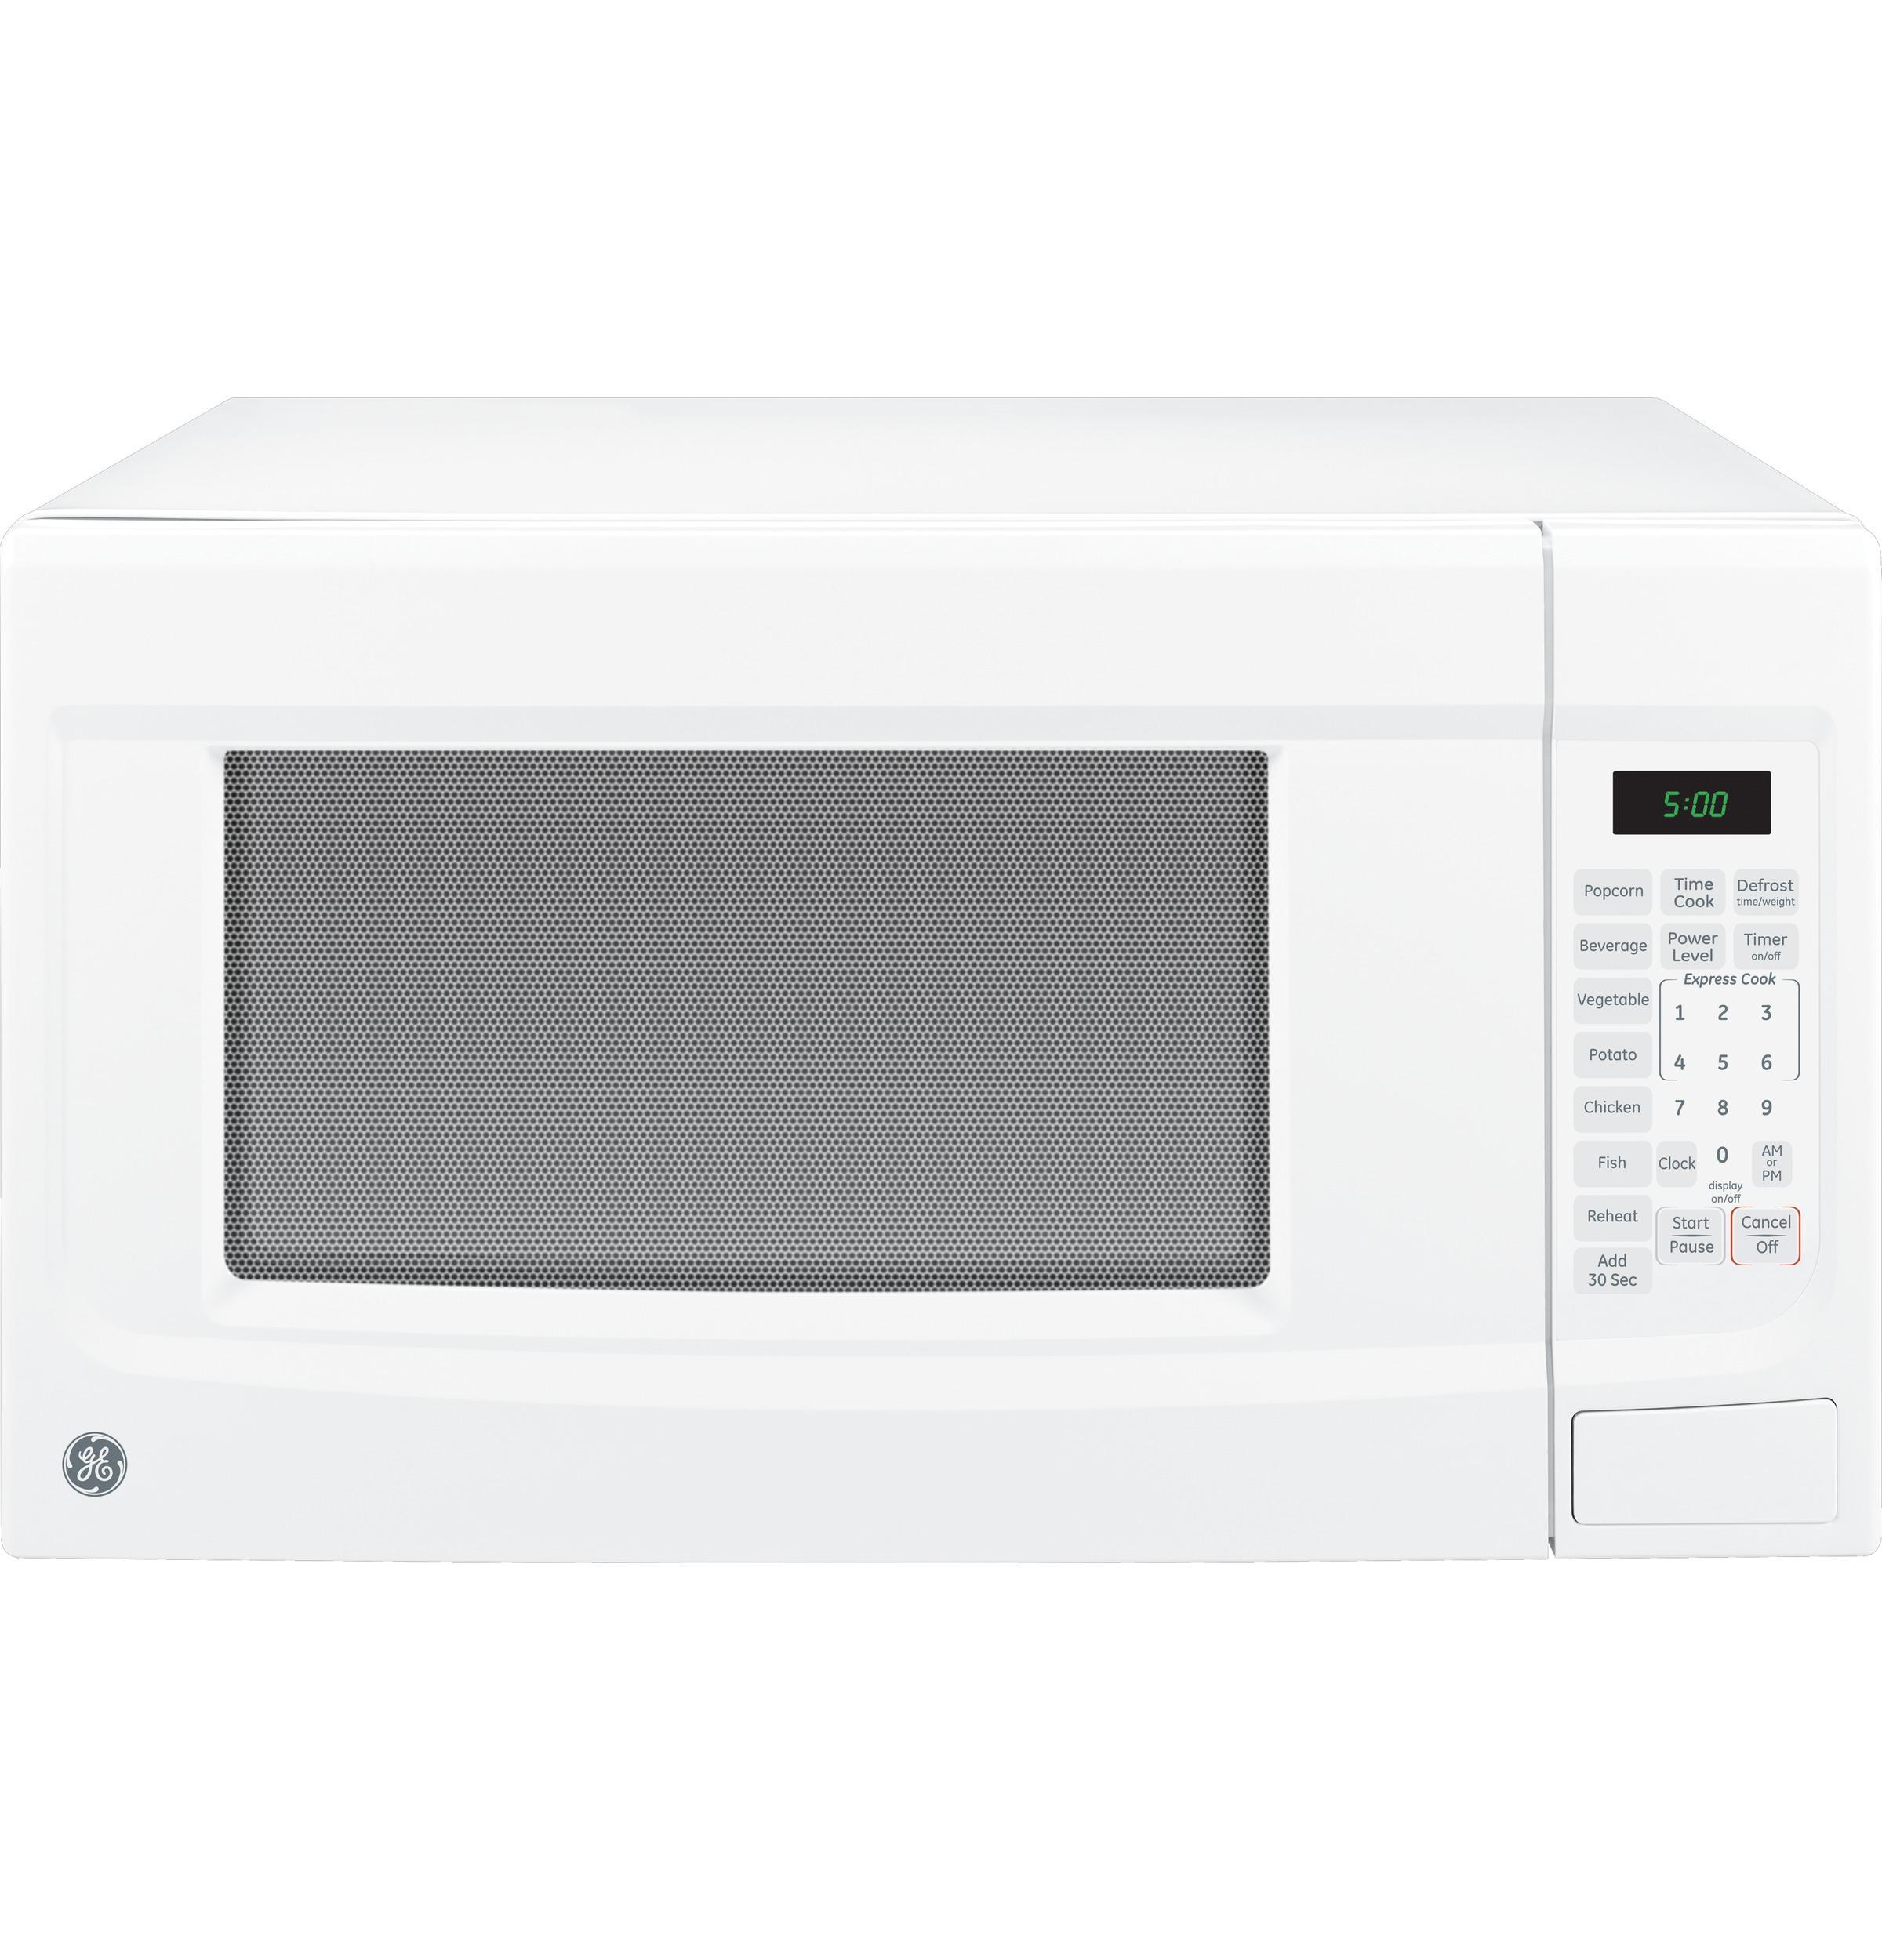 microwaves 1 4 cu ft countertop microwave by ge appliances at vandrie home furnishings